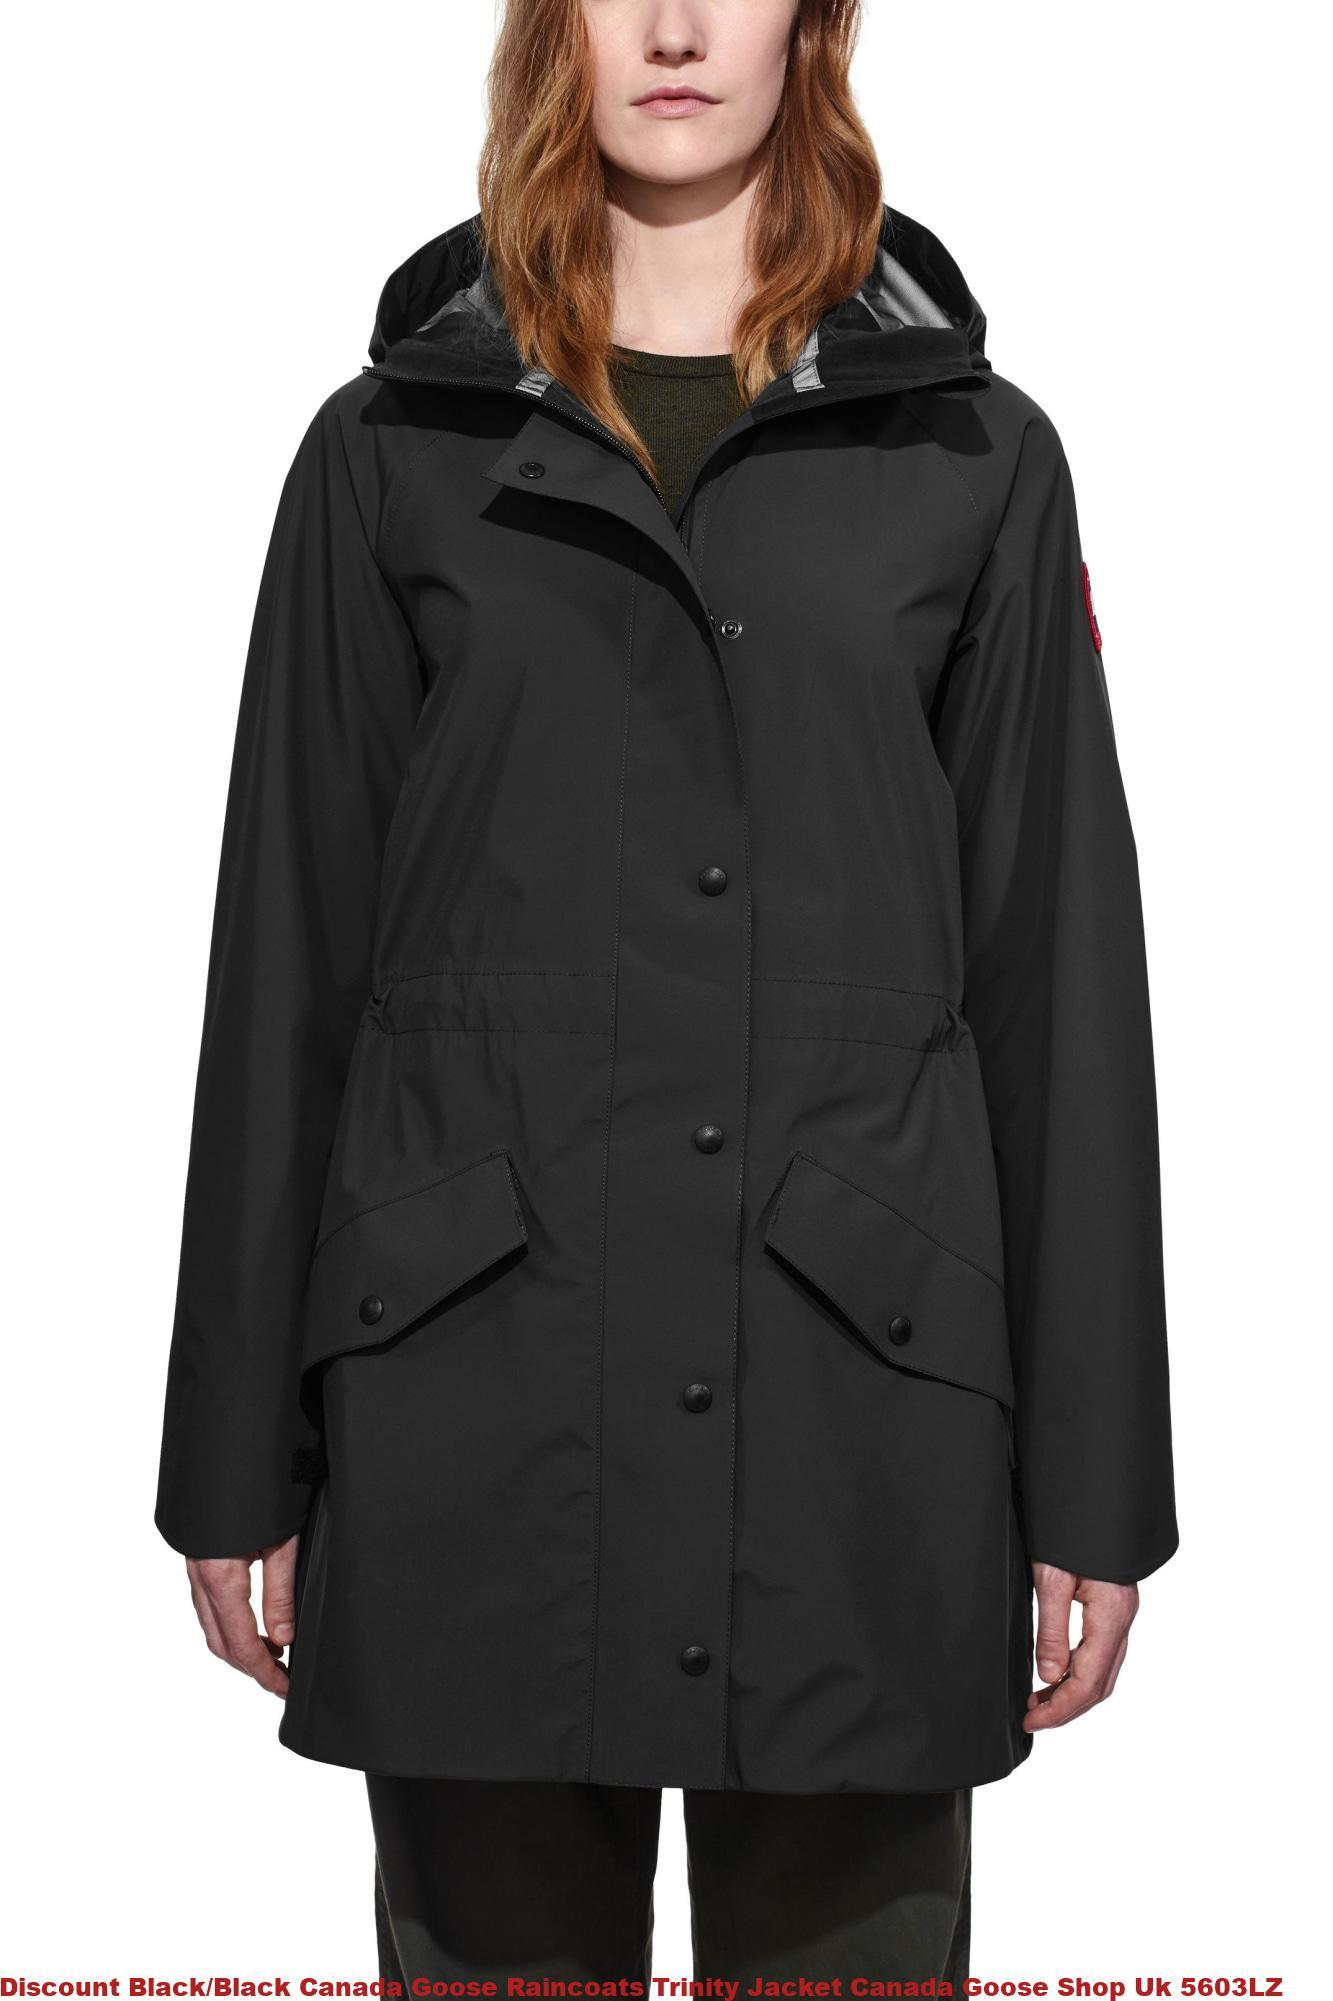 Discount Black Black Canada Goose Raincoats Trinity Jacket